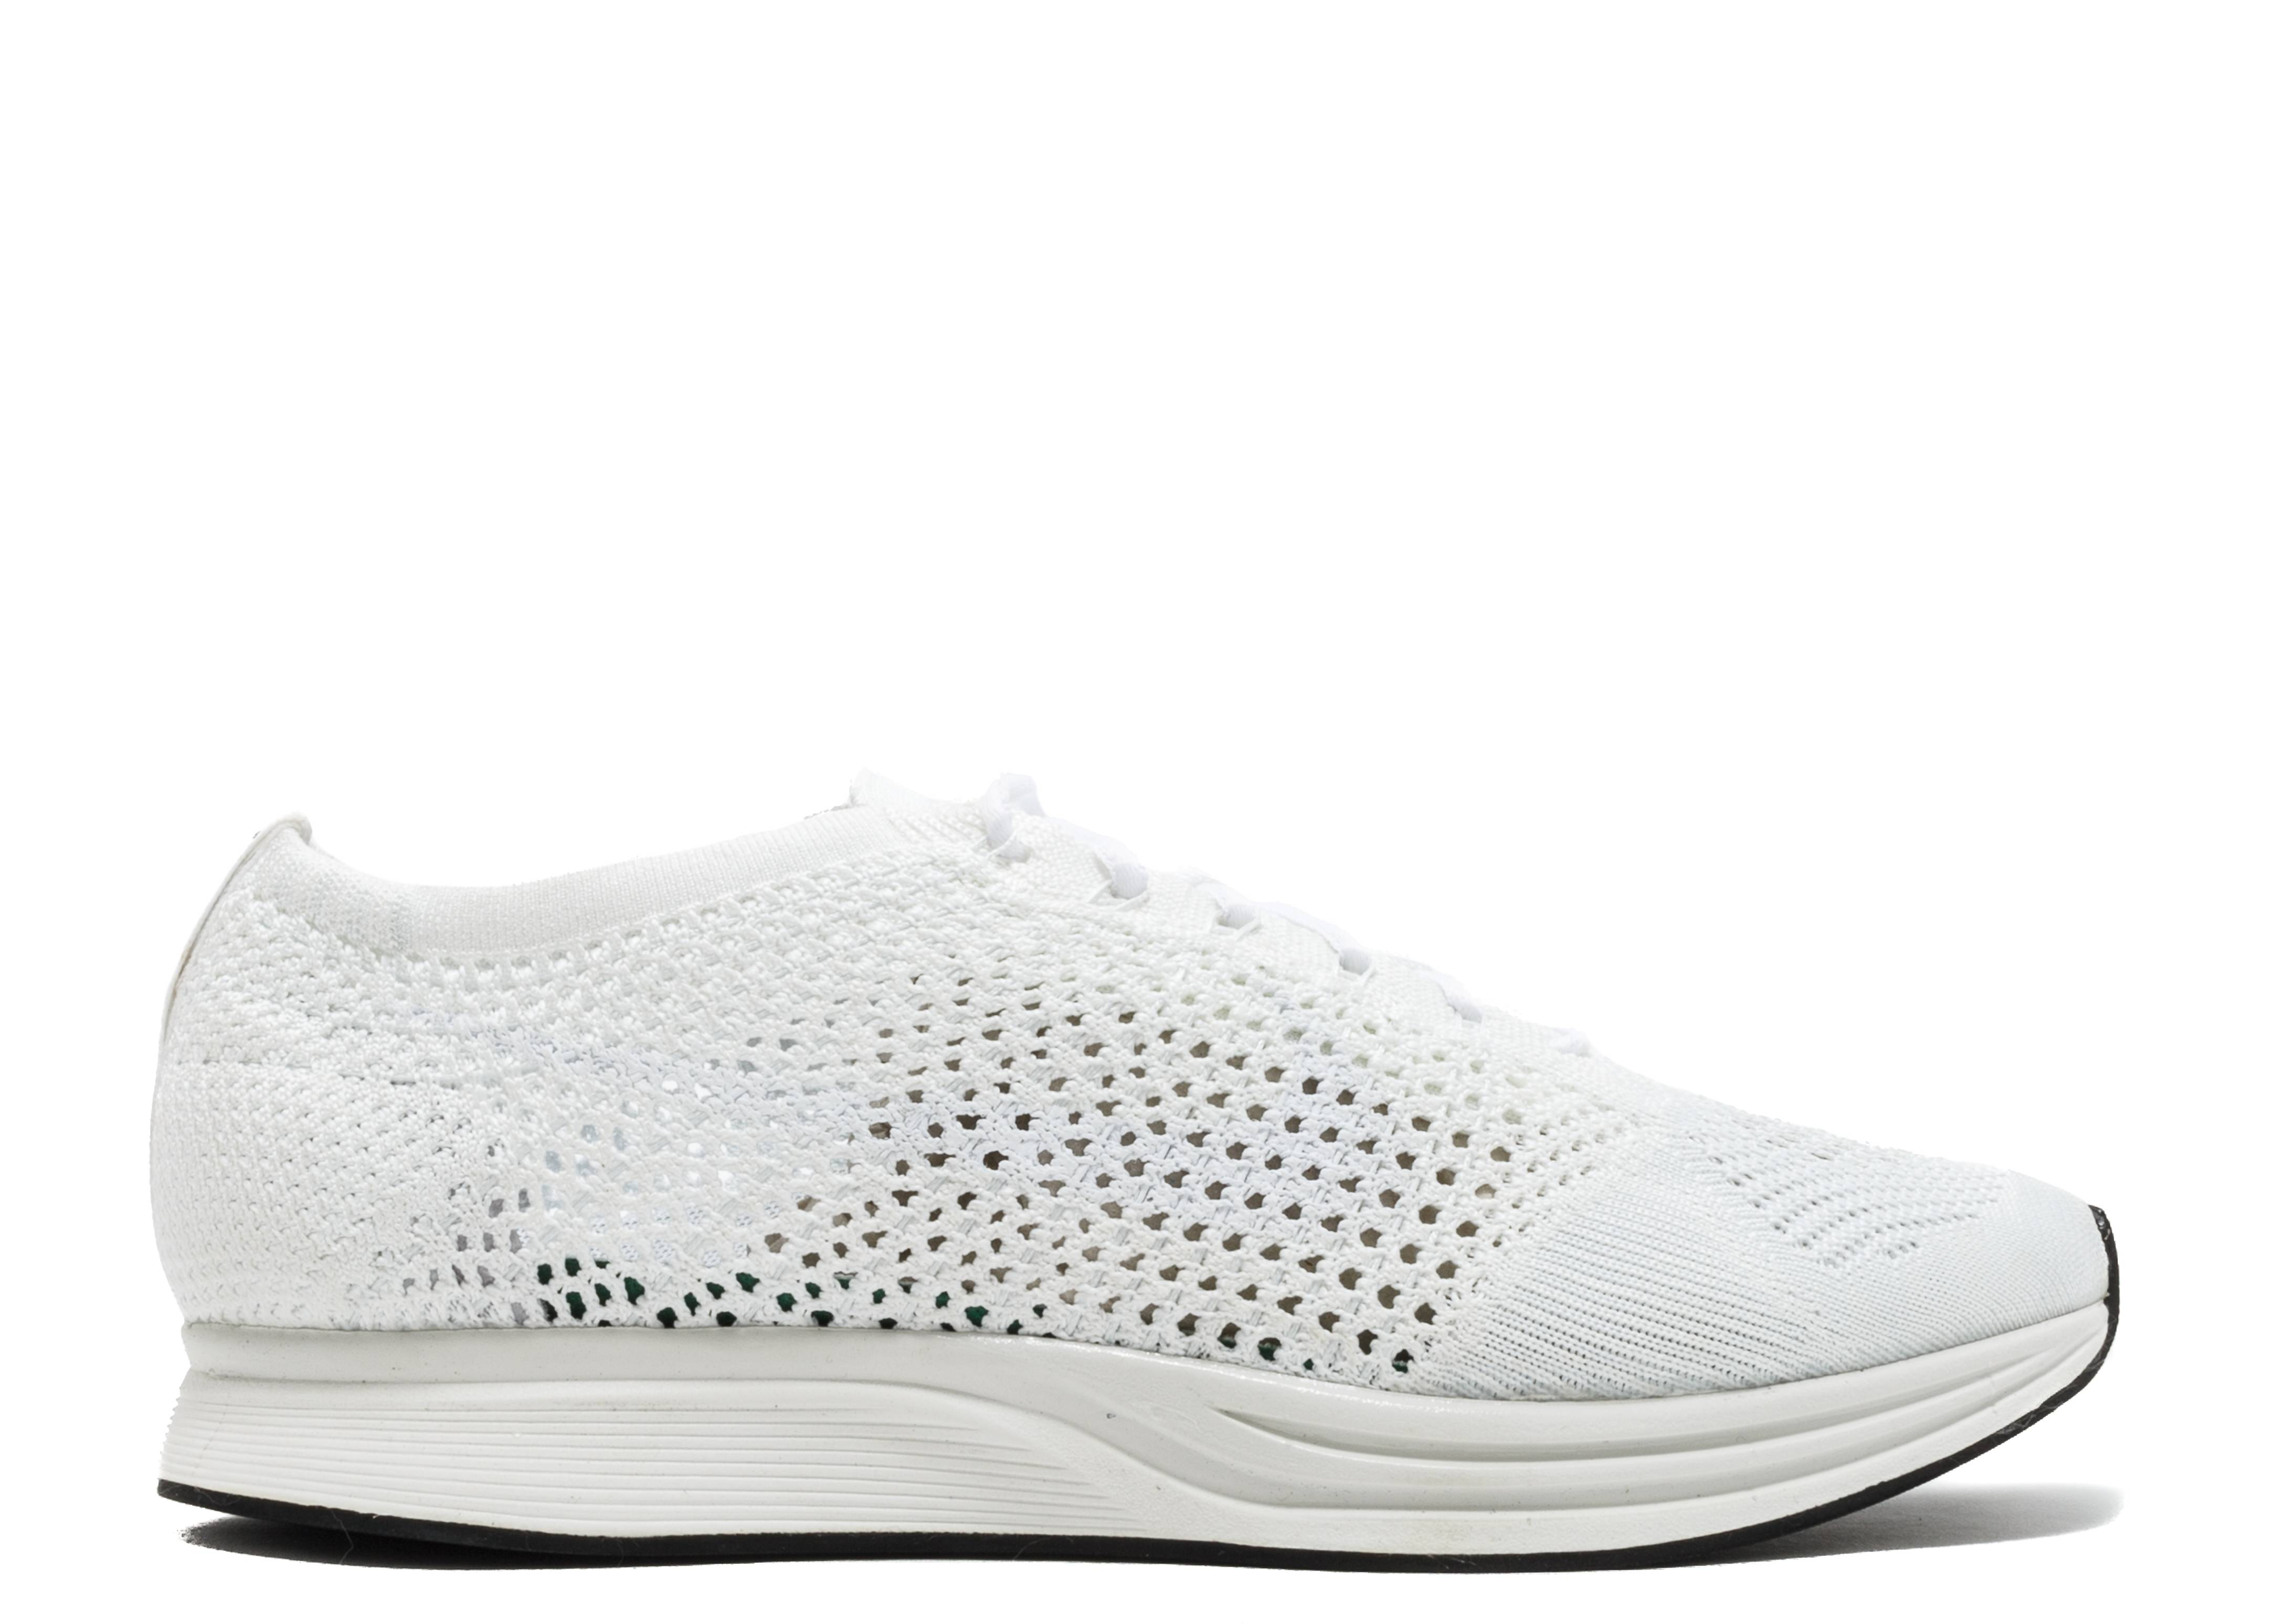 Sinceramente pesadilla Judías verdes  Flyknit Racer 'Triple White' - Nike - 526628 100 - white/white-sail |  Flight Club